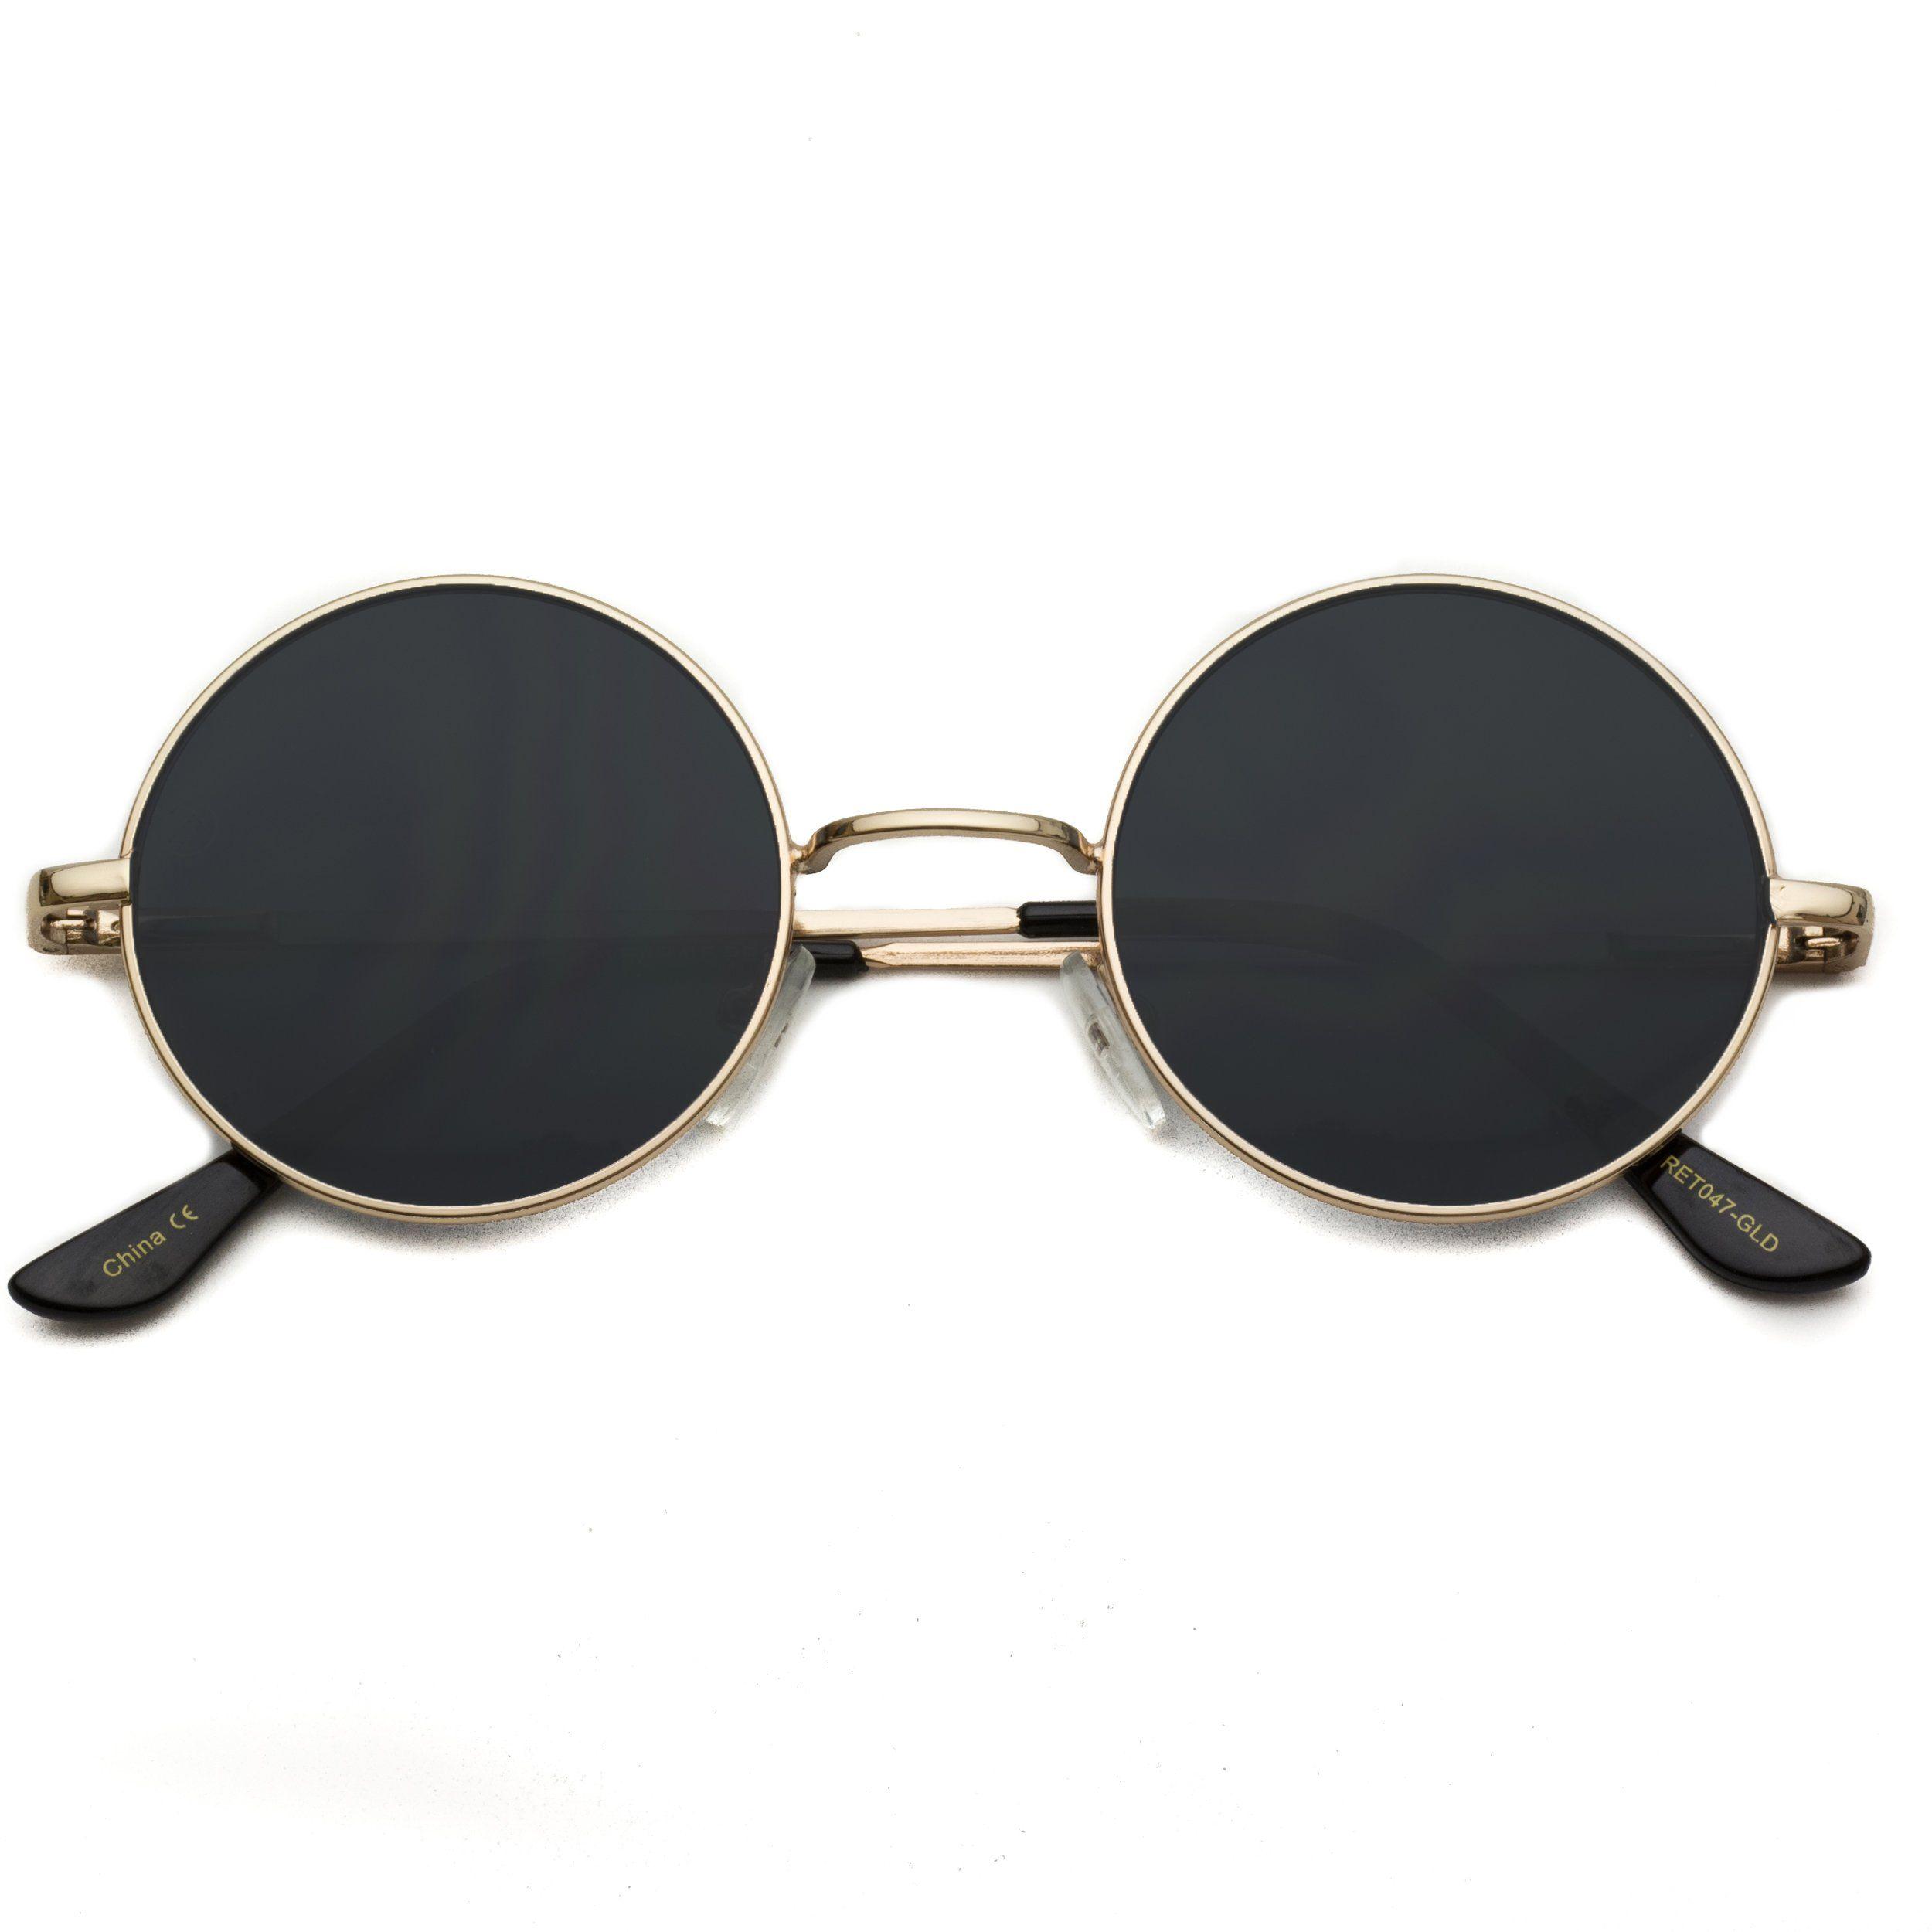 f02dbc37ec0 Ethel Retro Round Metal Hippie Sunglasses - John Lennon Inspired Sunglasses